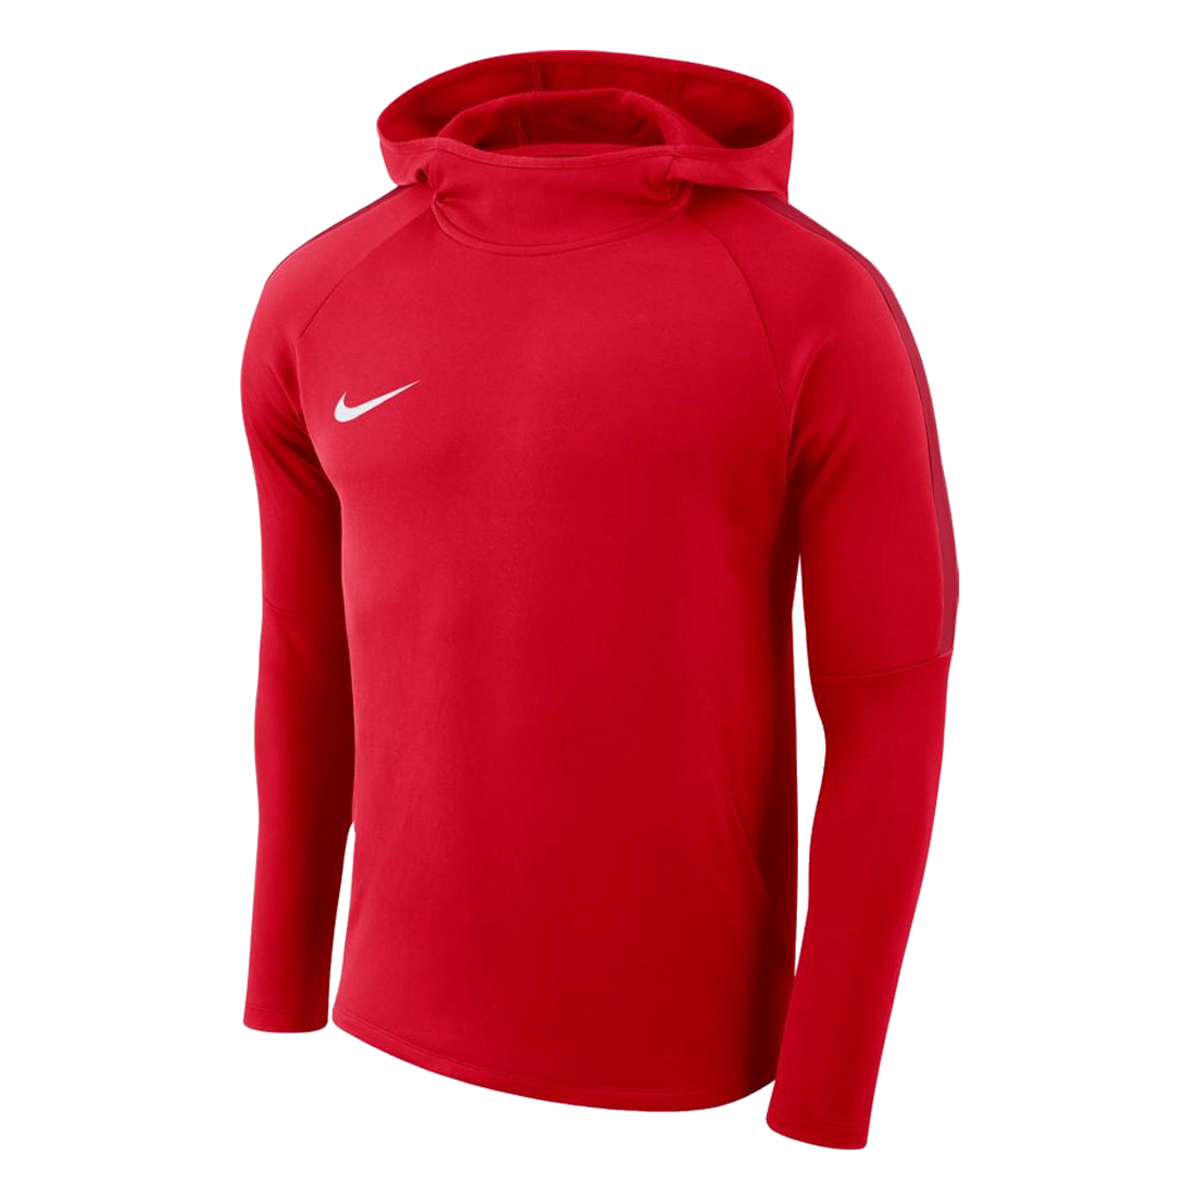 Nike trui met capuchon Academy 18 hoody roodwit Voetbal shop